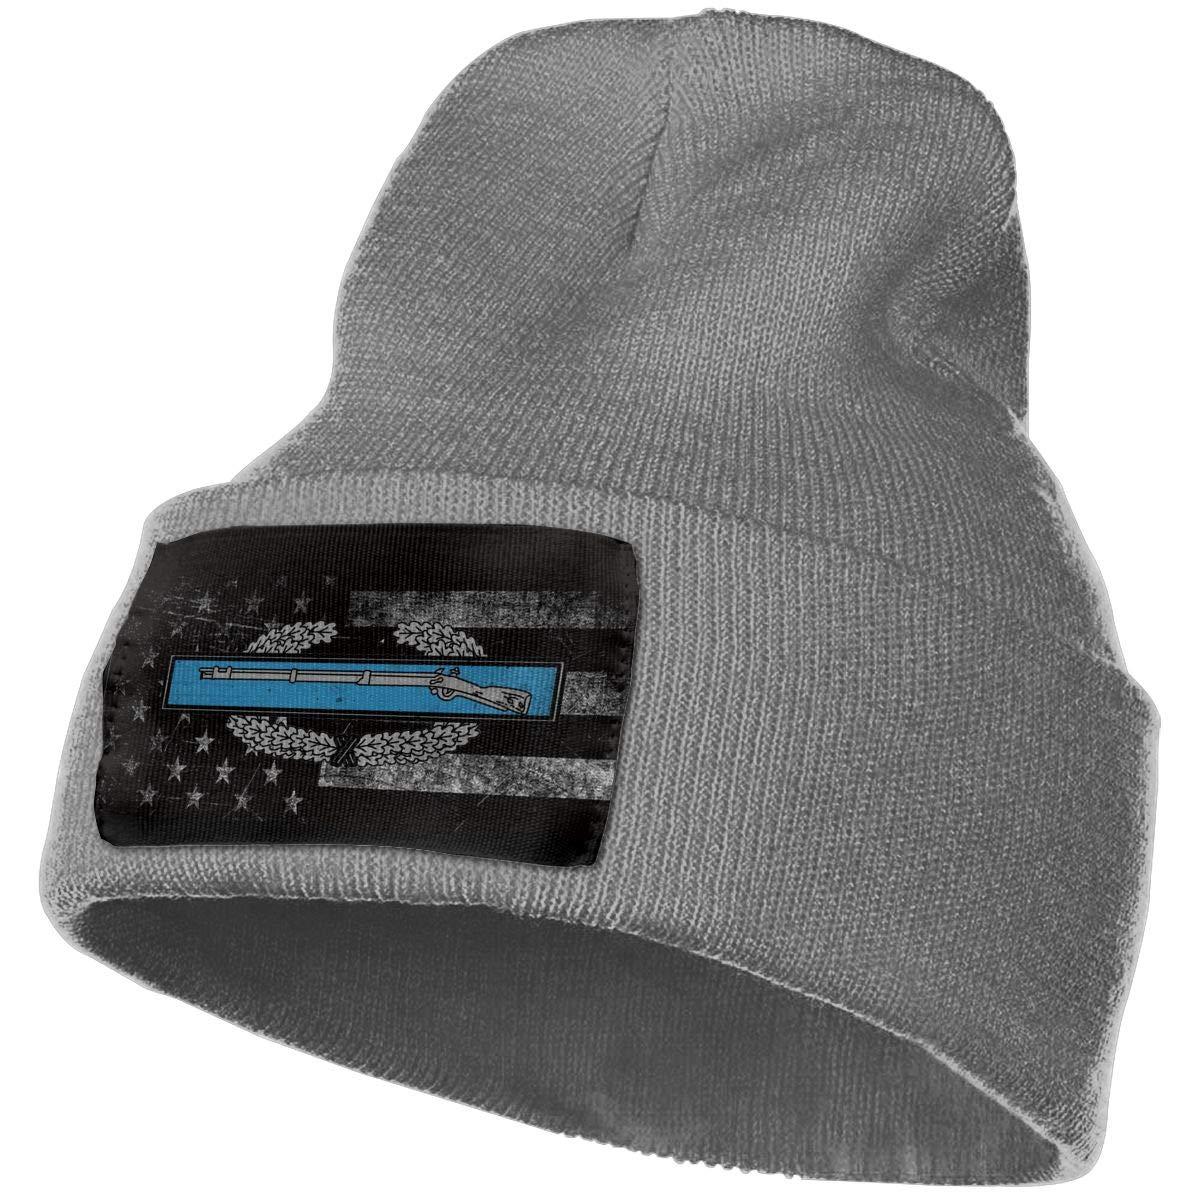 FORDSAN CP US Army Retro Combat Infantryman Mens Beanie Cap Skull Cap Winter Warm Knitting Hats.